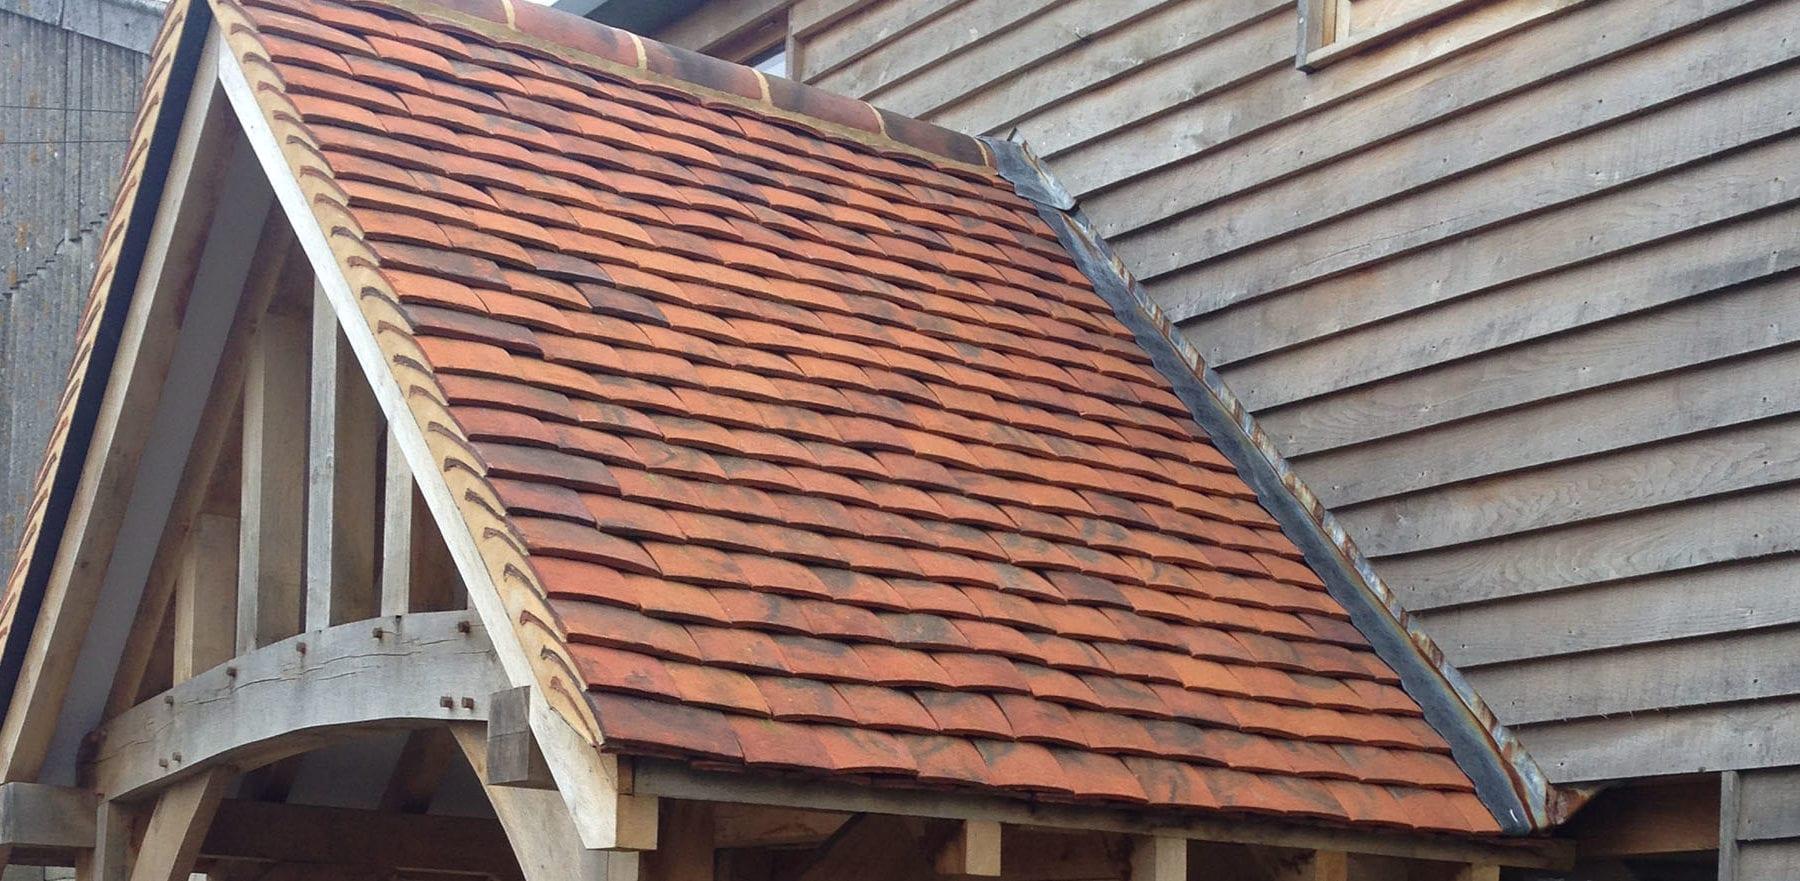 Lifestiles - Handmade Berkshire Clay Roof Tiles - Hartwood Oak, England 2